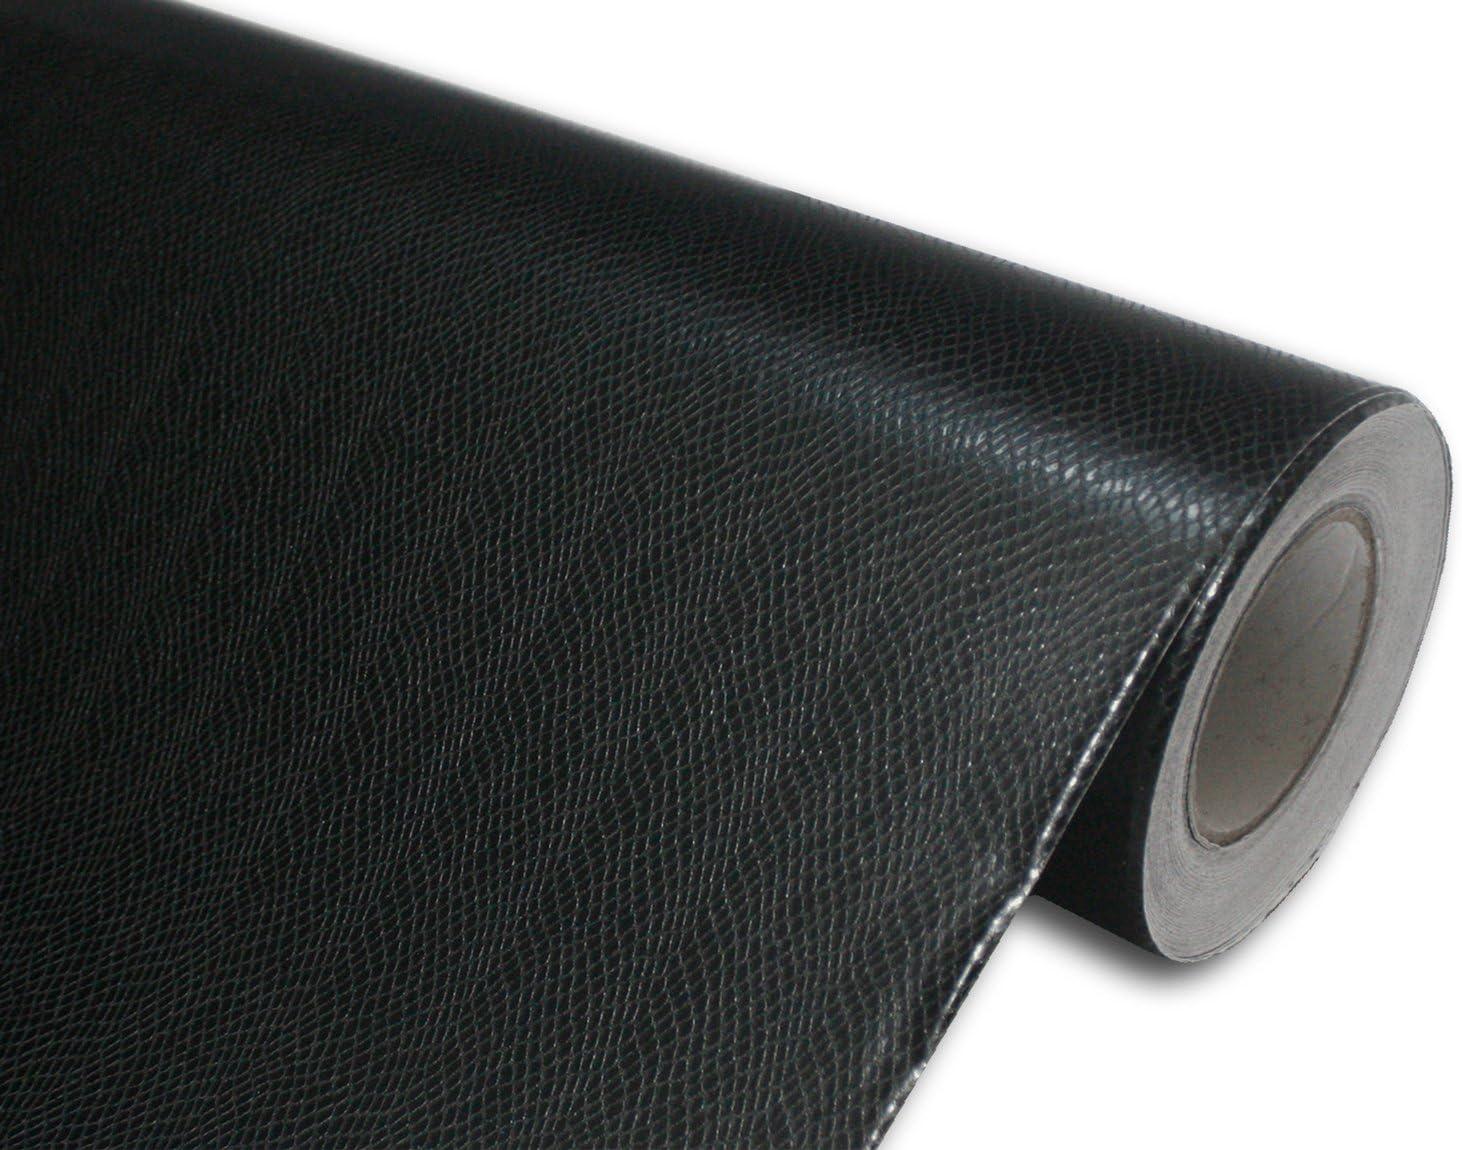 Hachi Auto Black Max 60% OFF Snake Skin Car Wrap SALENEW very popular Vinyl Leather 36-by-60-inch